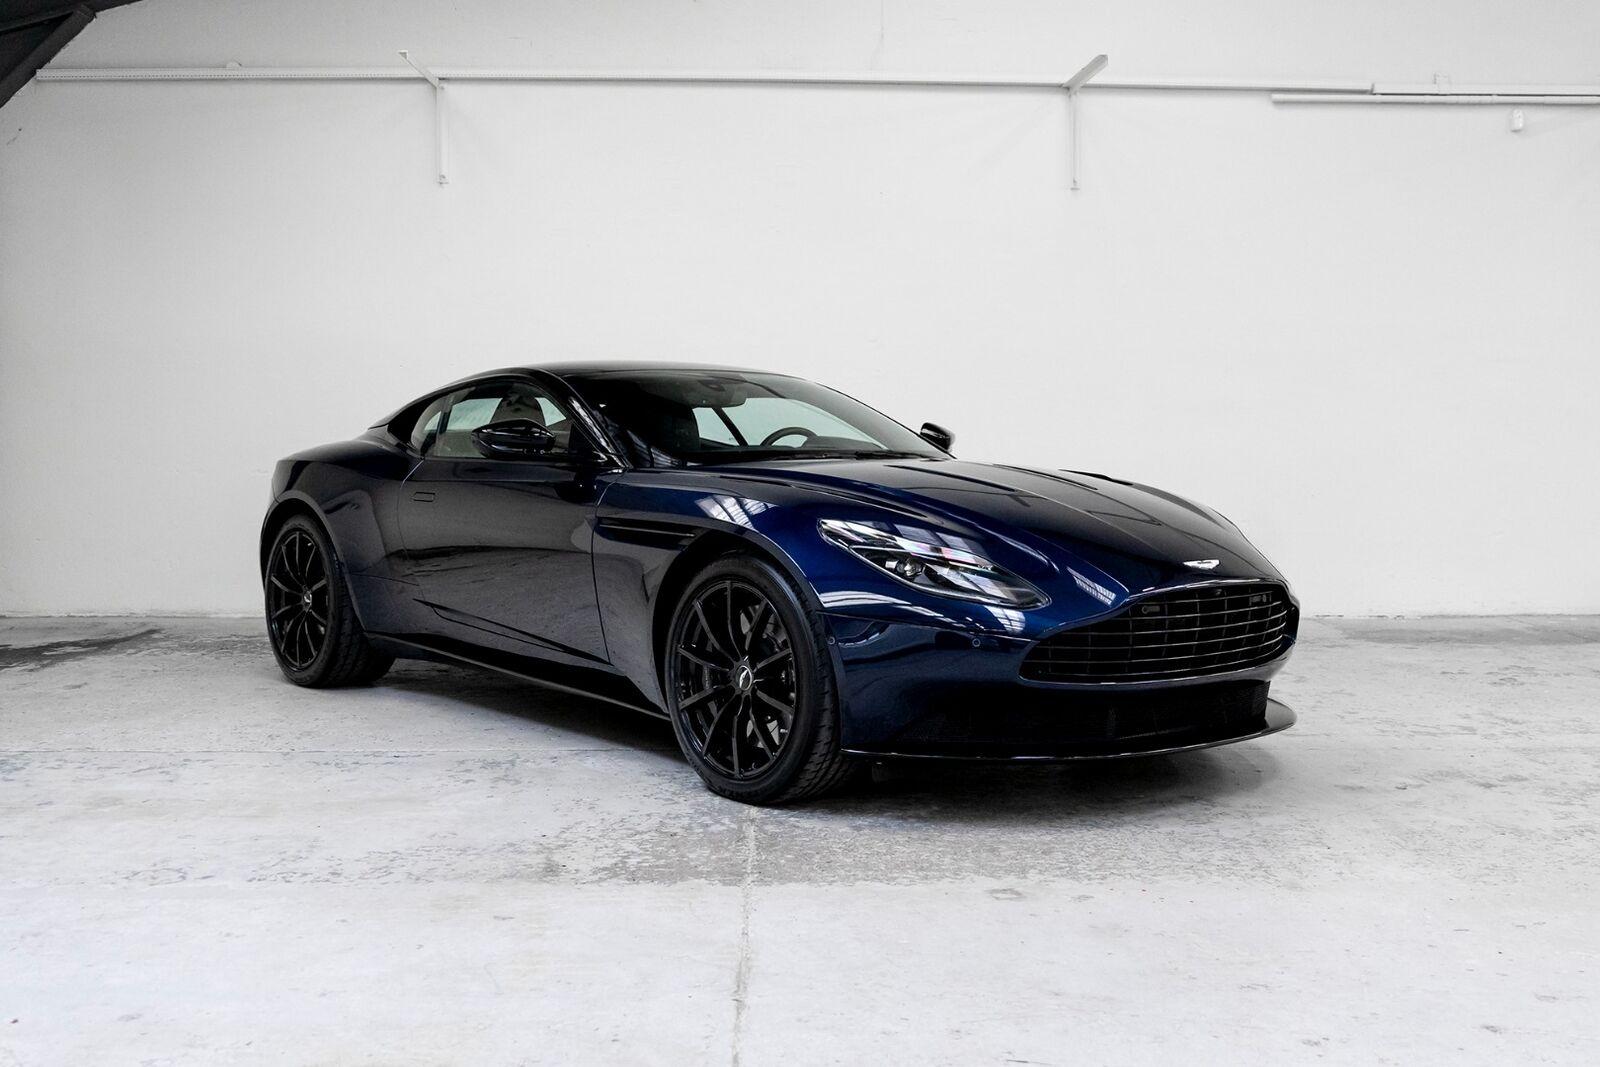 Aston Martin DB11 5,2 V12 Coupé AMR aut. 2d - 1.280.000 kr.